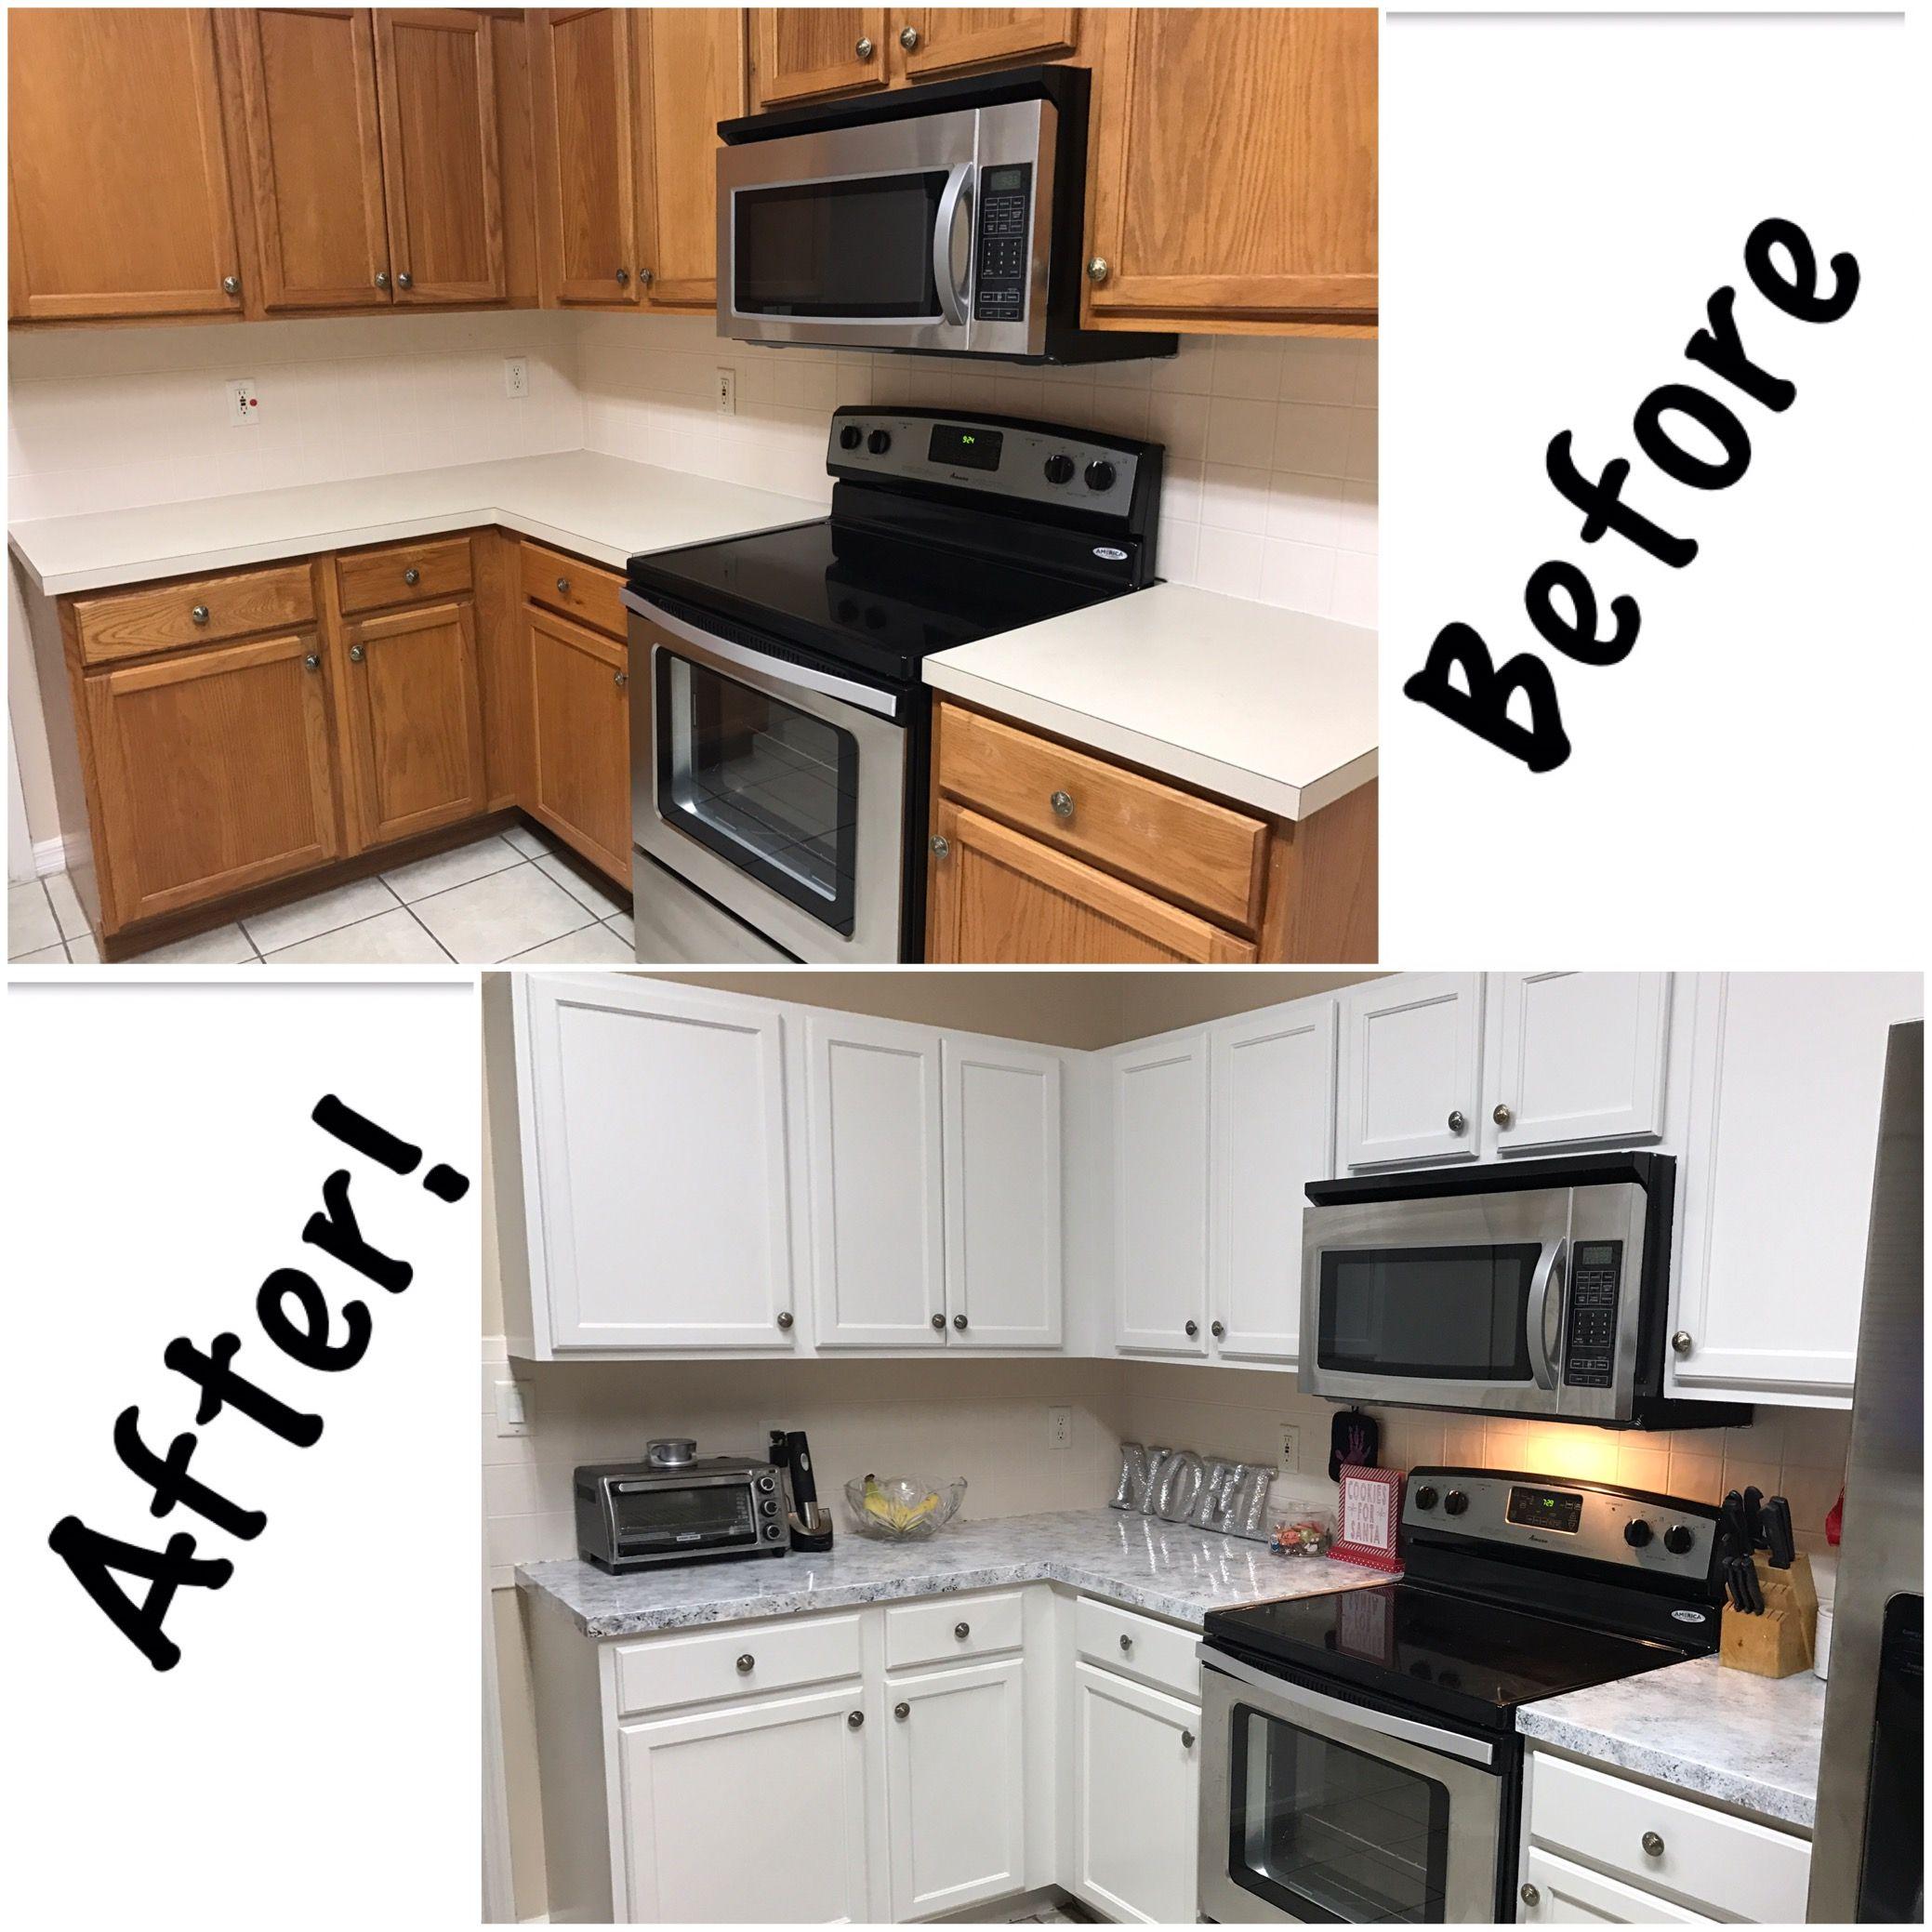 Diy Kitchen Counter Tops Faux Granite Valspar Cabinet Enamel Valspar Cabinet Enamel Room Interior Living Room Interior